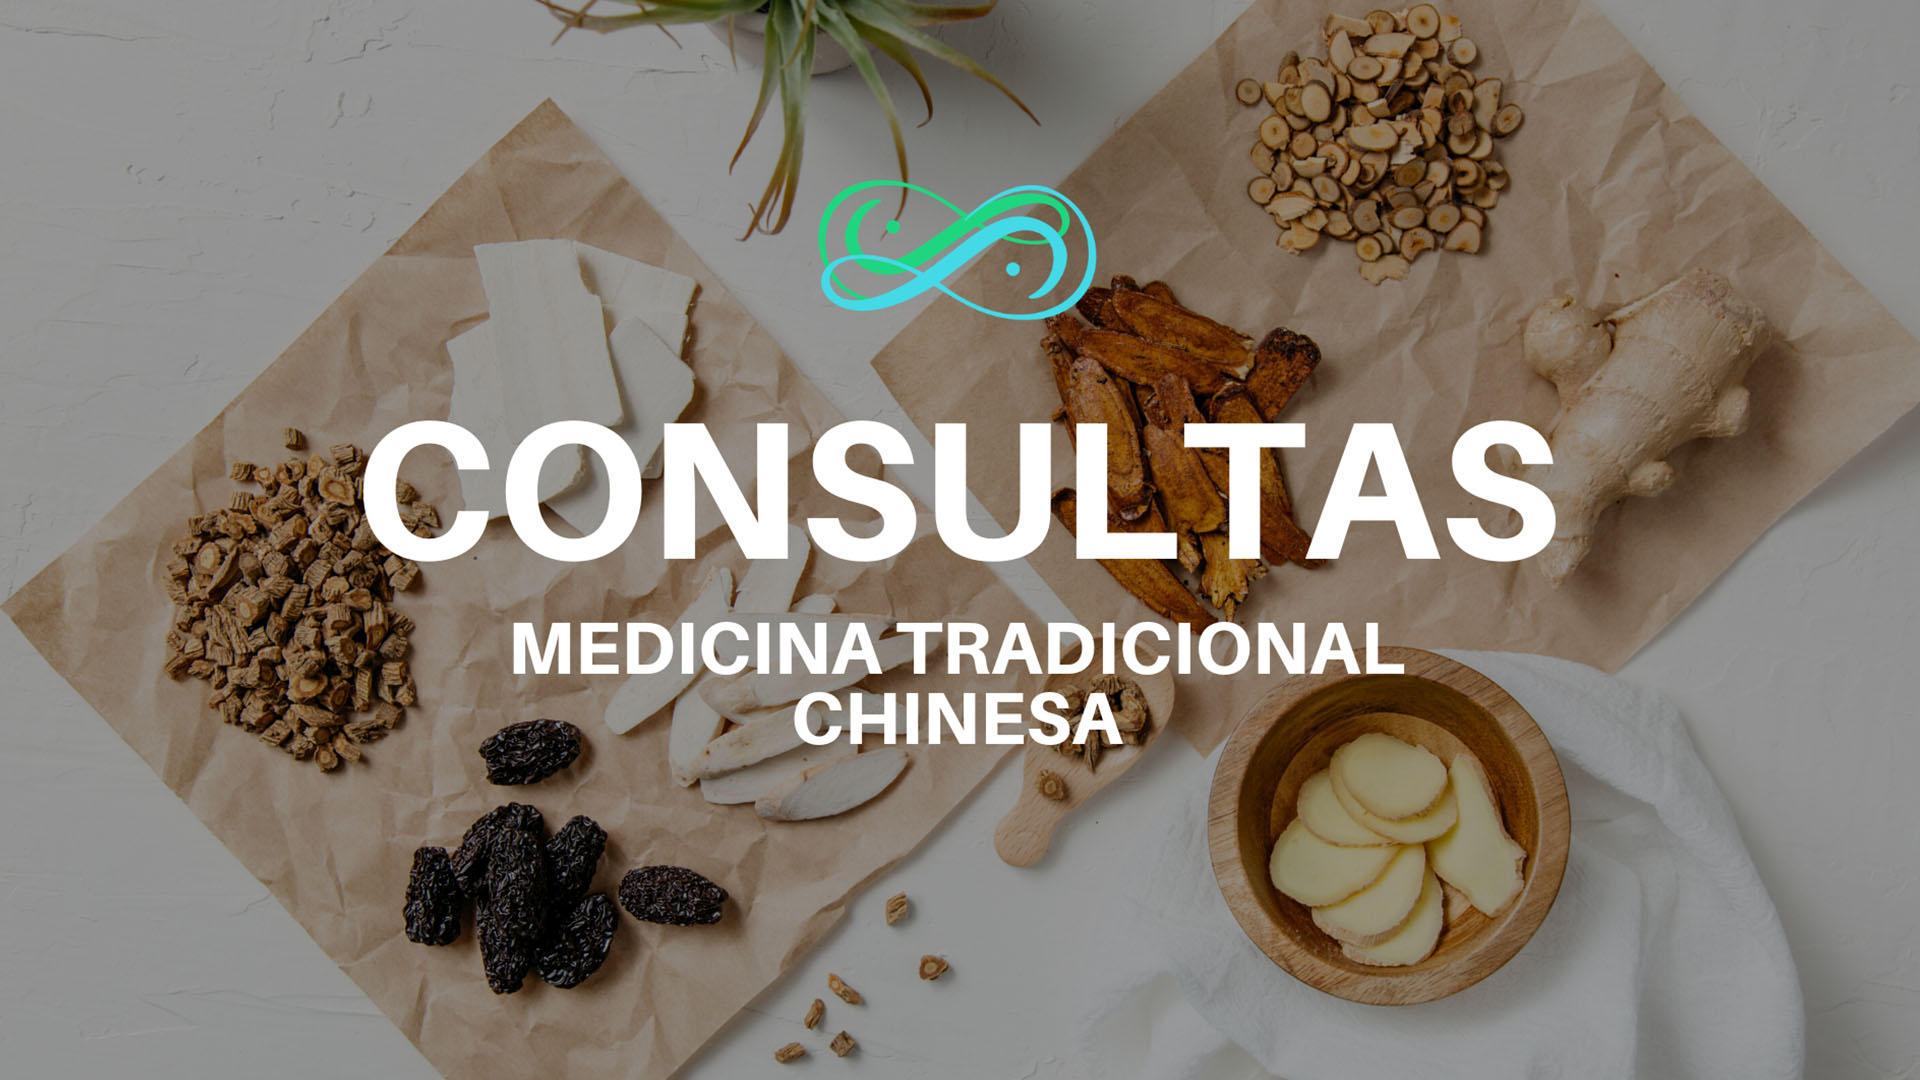 Consultas medicina tradicional chinesa